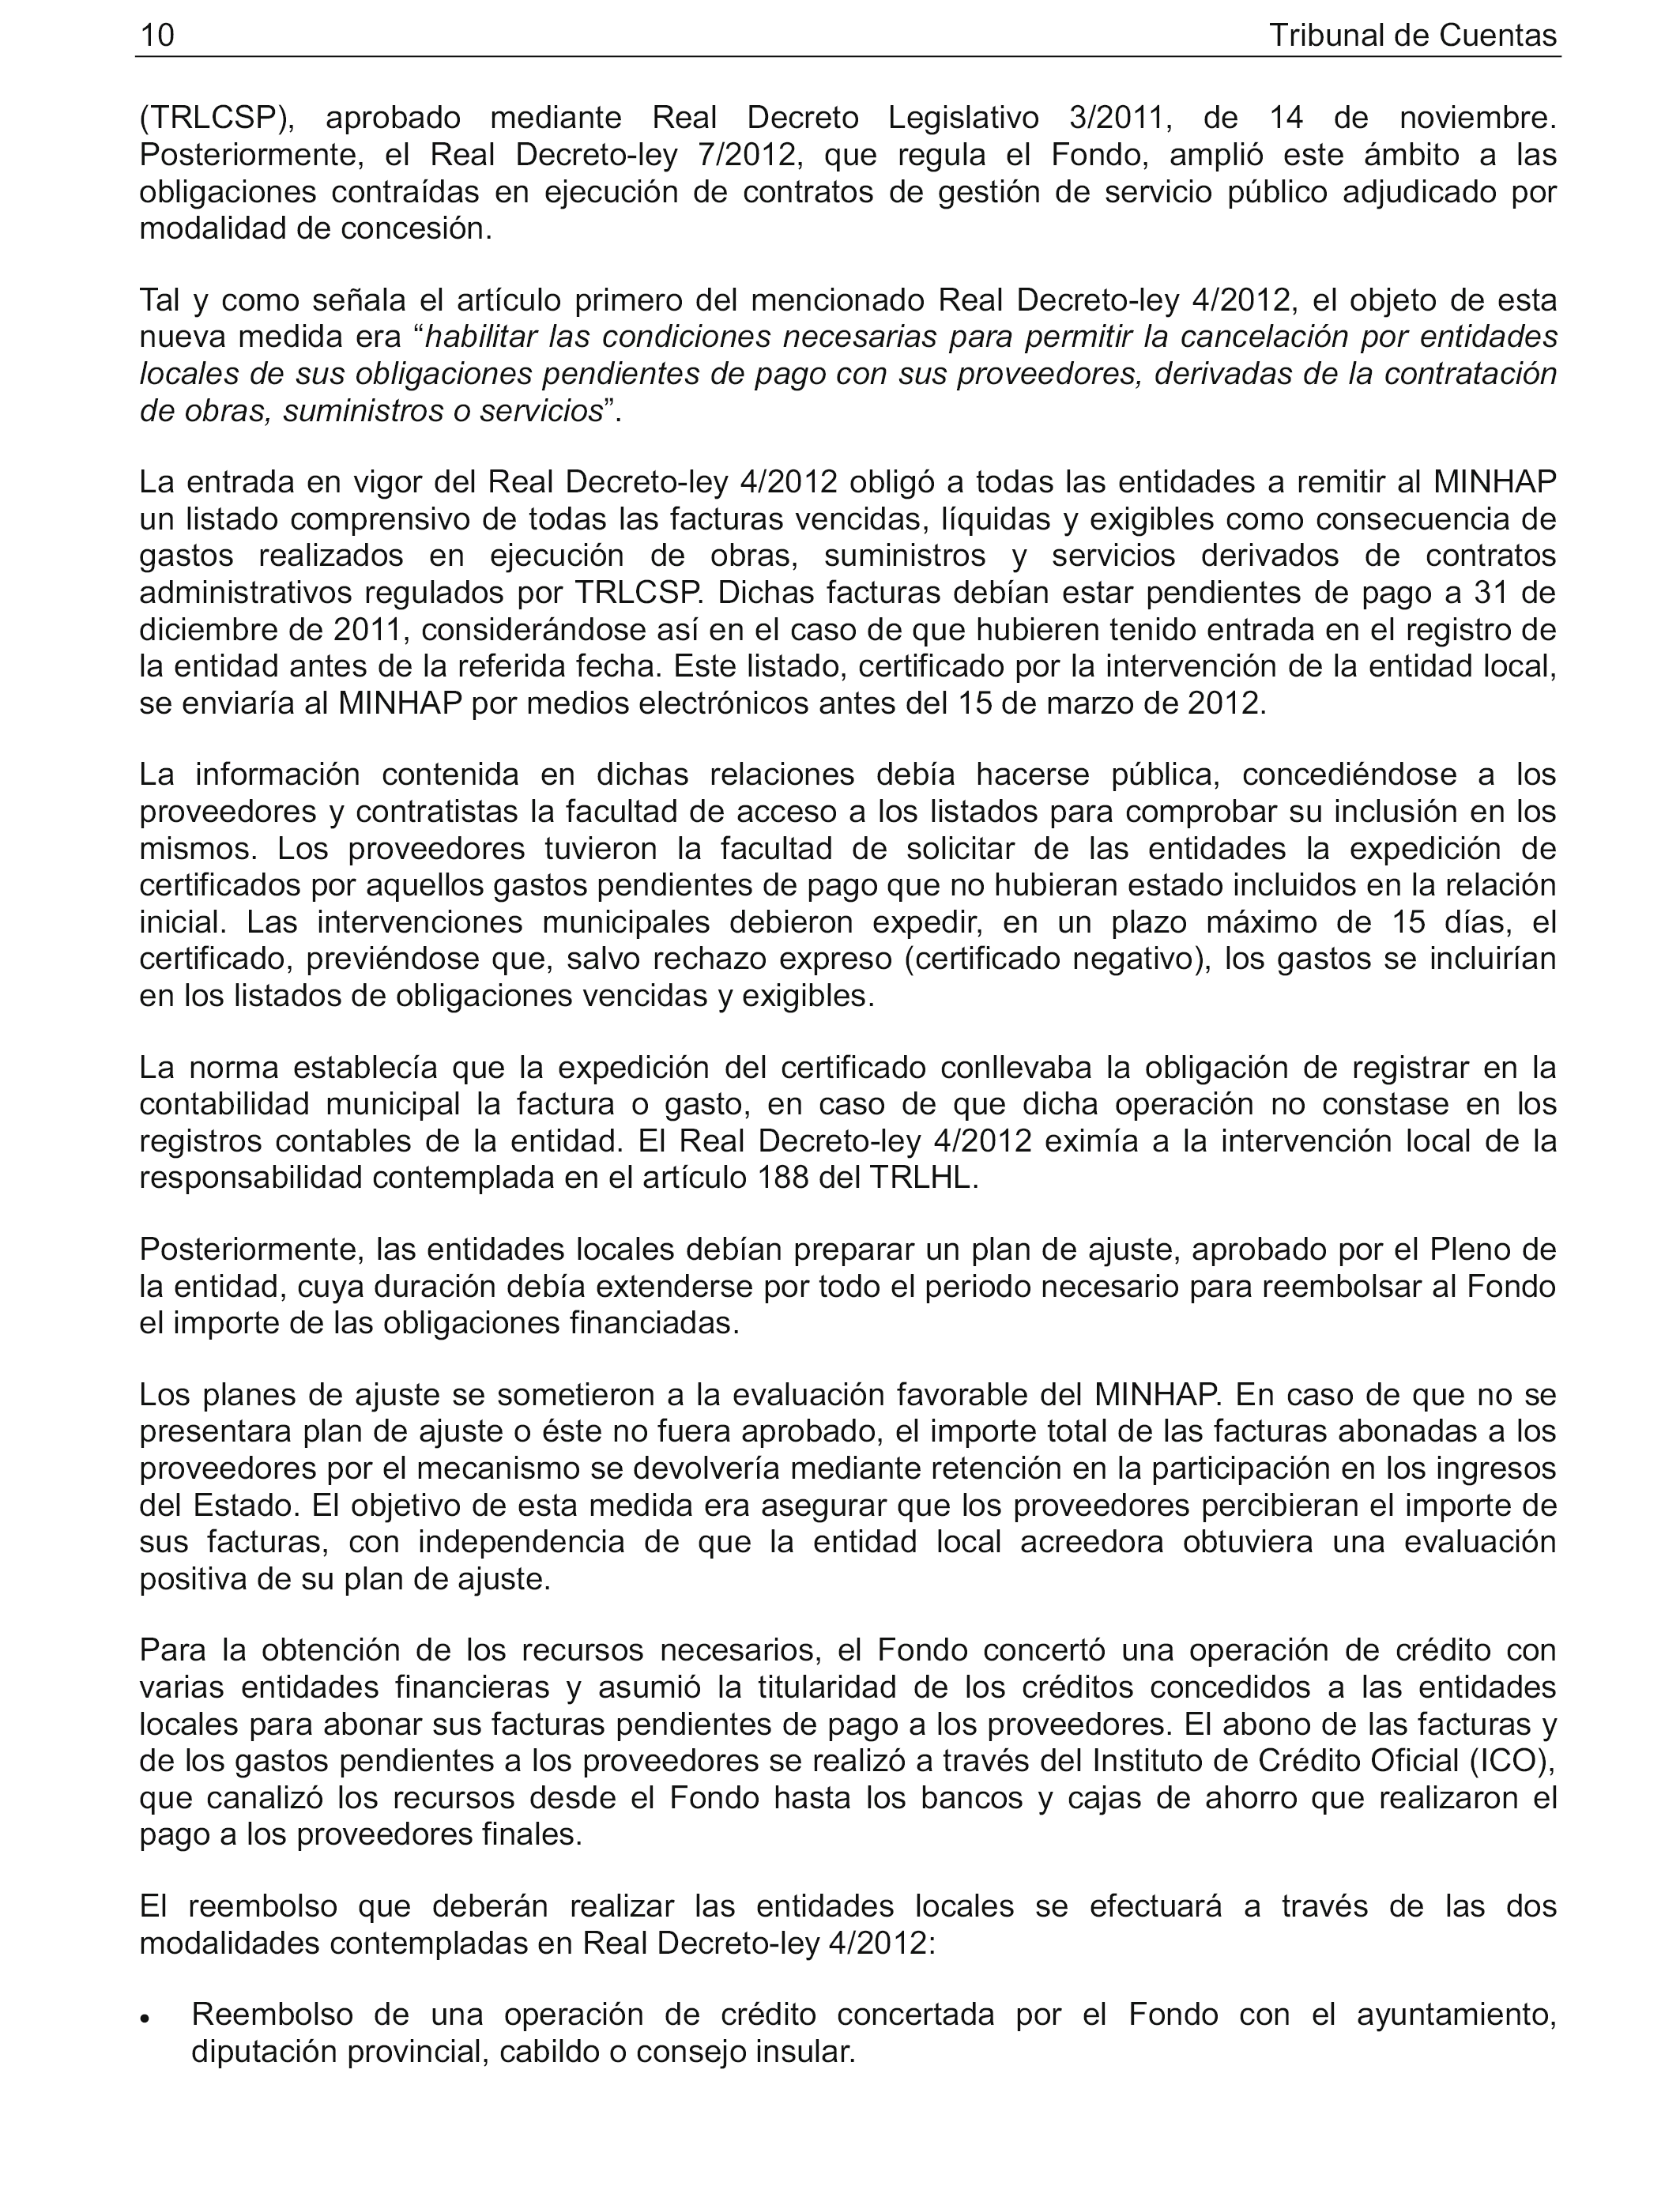 BOE.es - Documento BOE-A-2017-3248